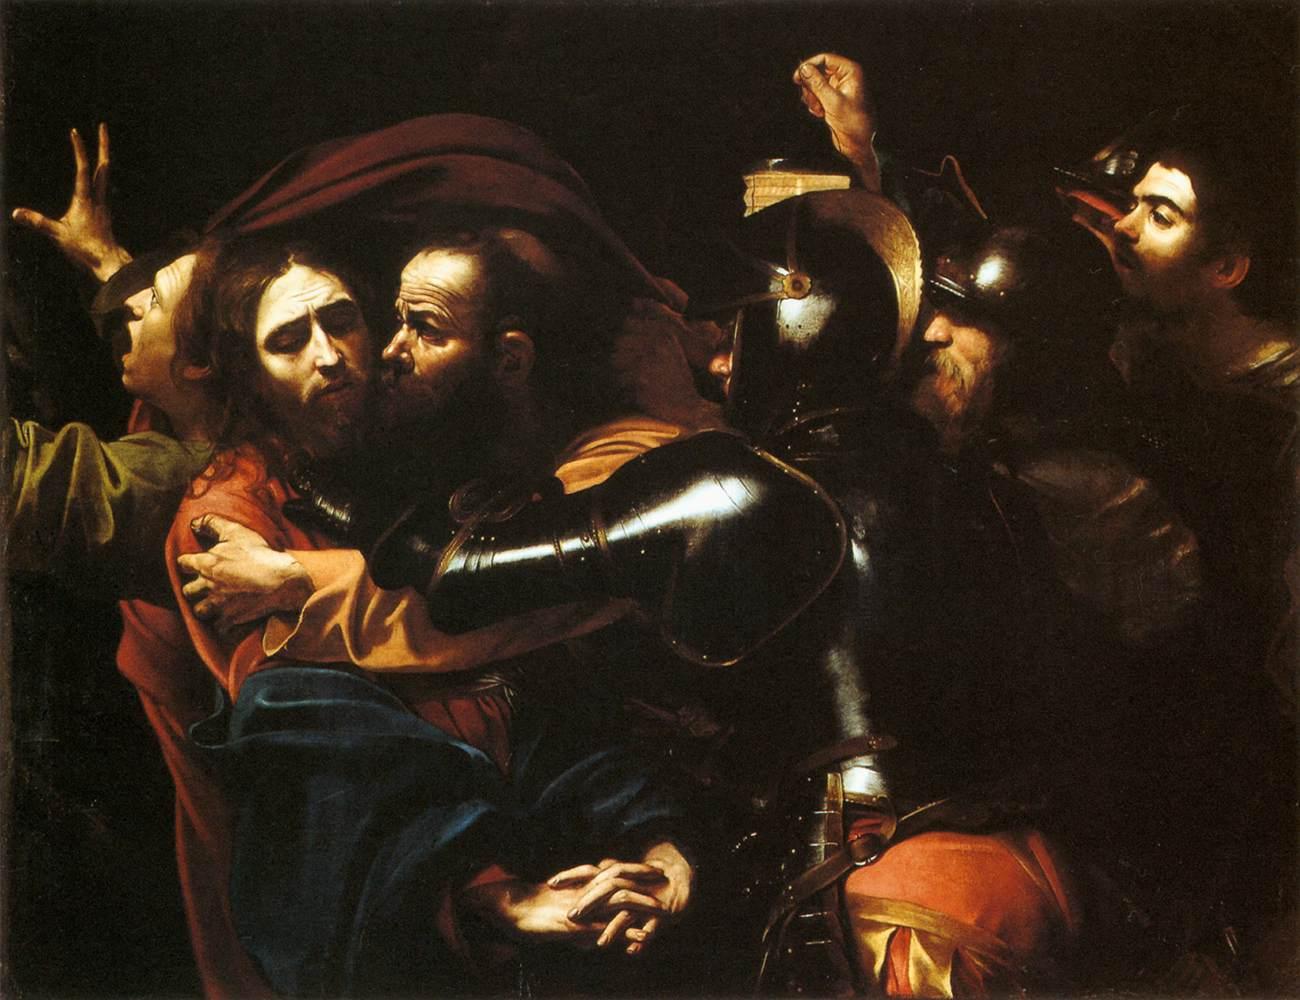 [Image: Caravaggio%2C%20Taking%20of%20Christ%2C%201602.jpg?dl=0]